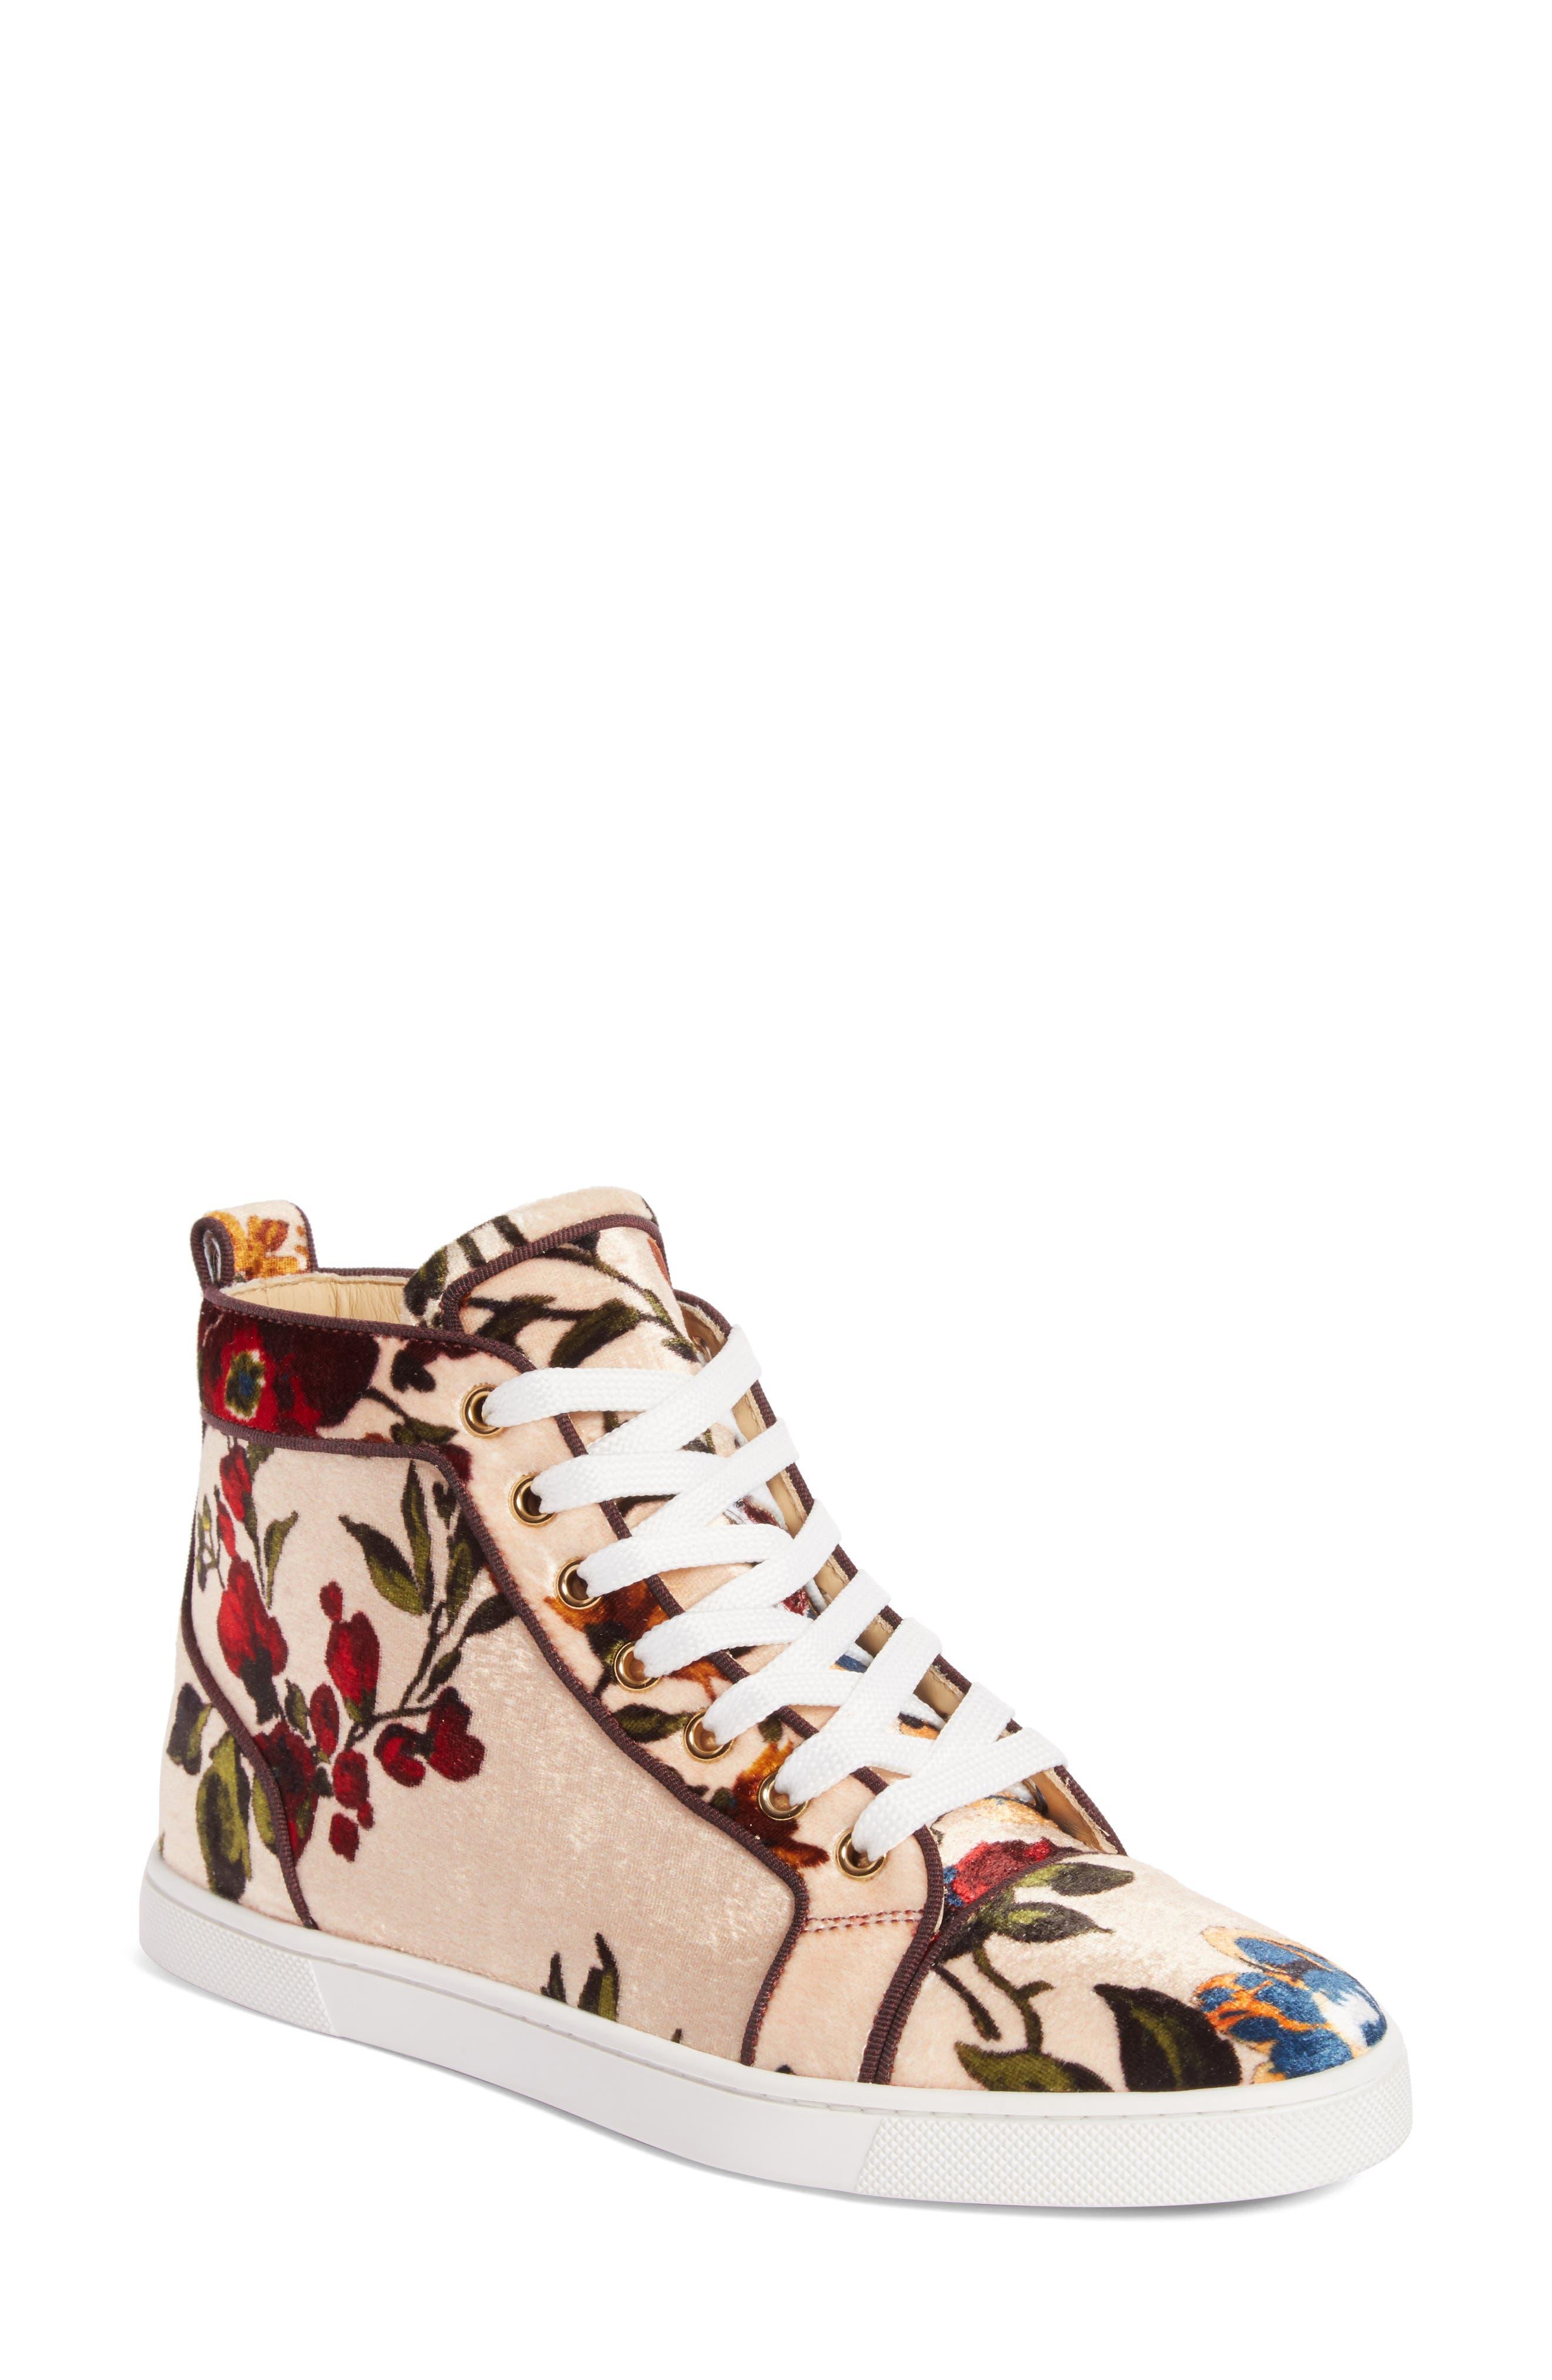 CHRISTIAN LOUBOUTIN Bip Bip Floral Sneaker, Main, color, 250